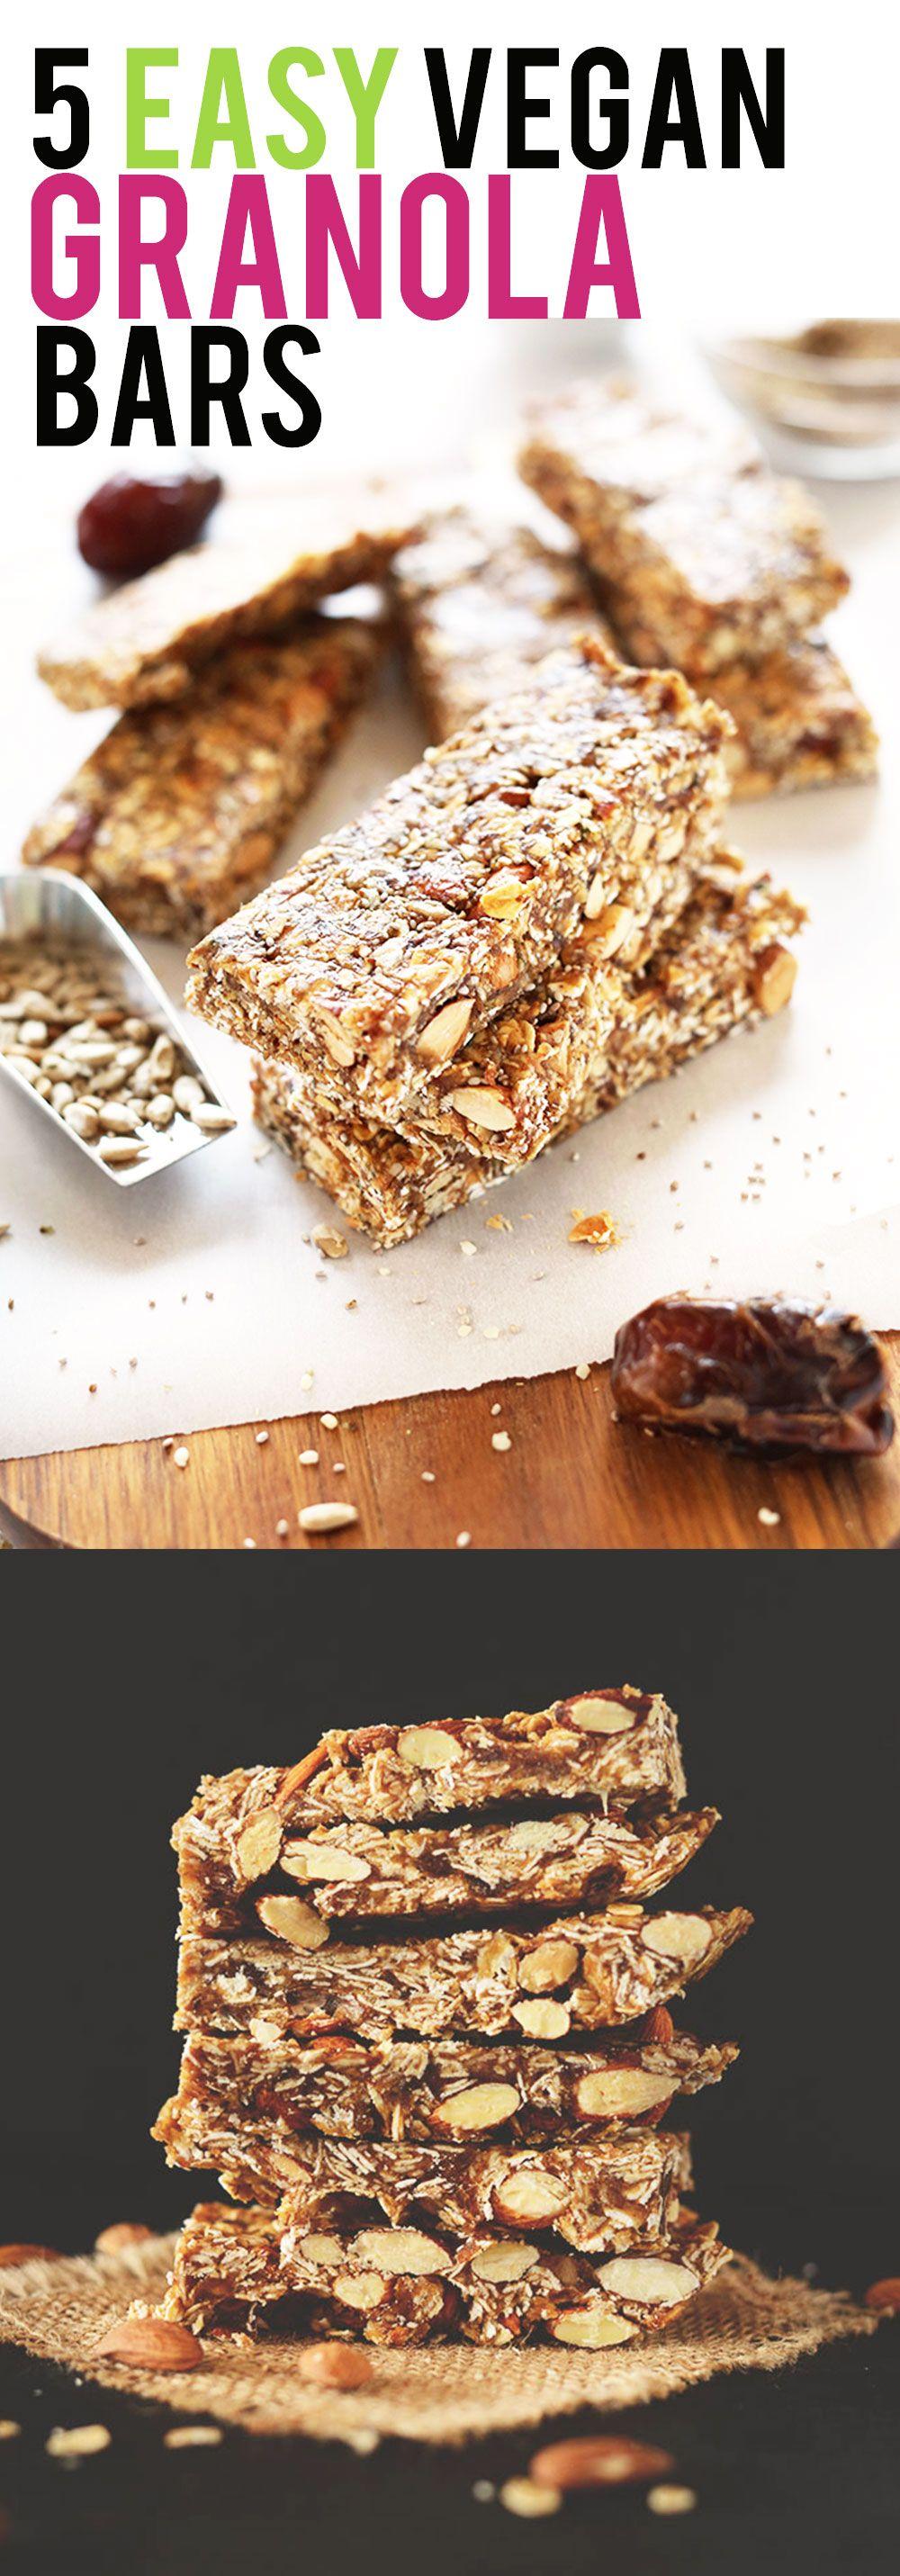 Vegan Granola Bars Minimalist Baker Recipes Vegan Granola Bar Recipe Vegan Granola Vegan Granola Bars